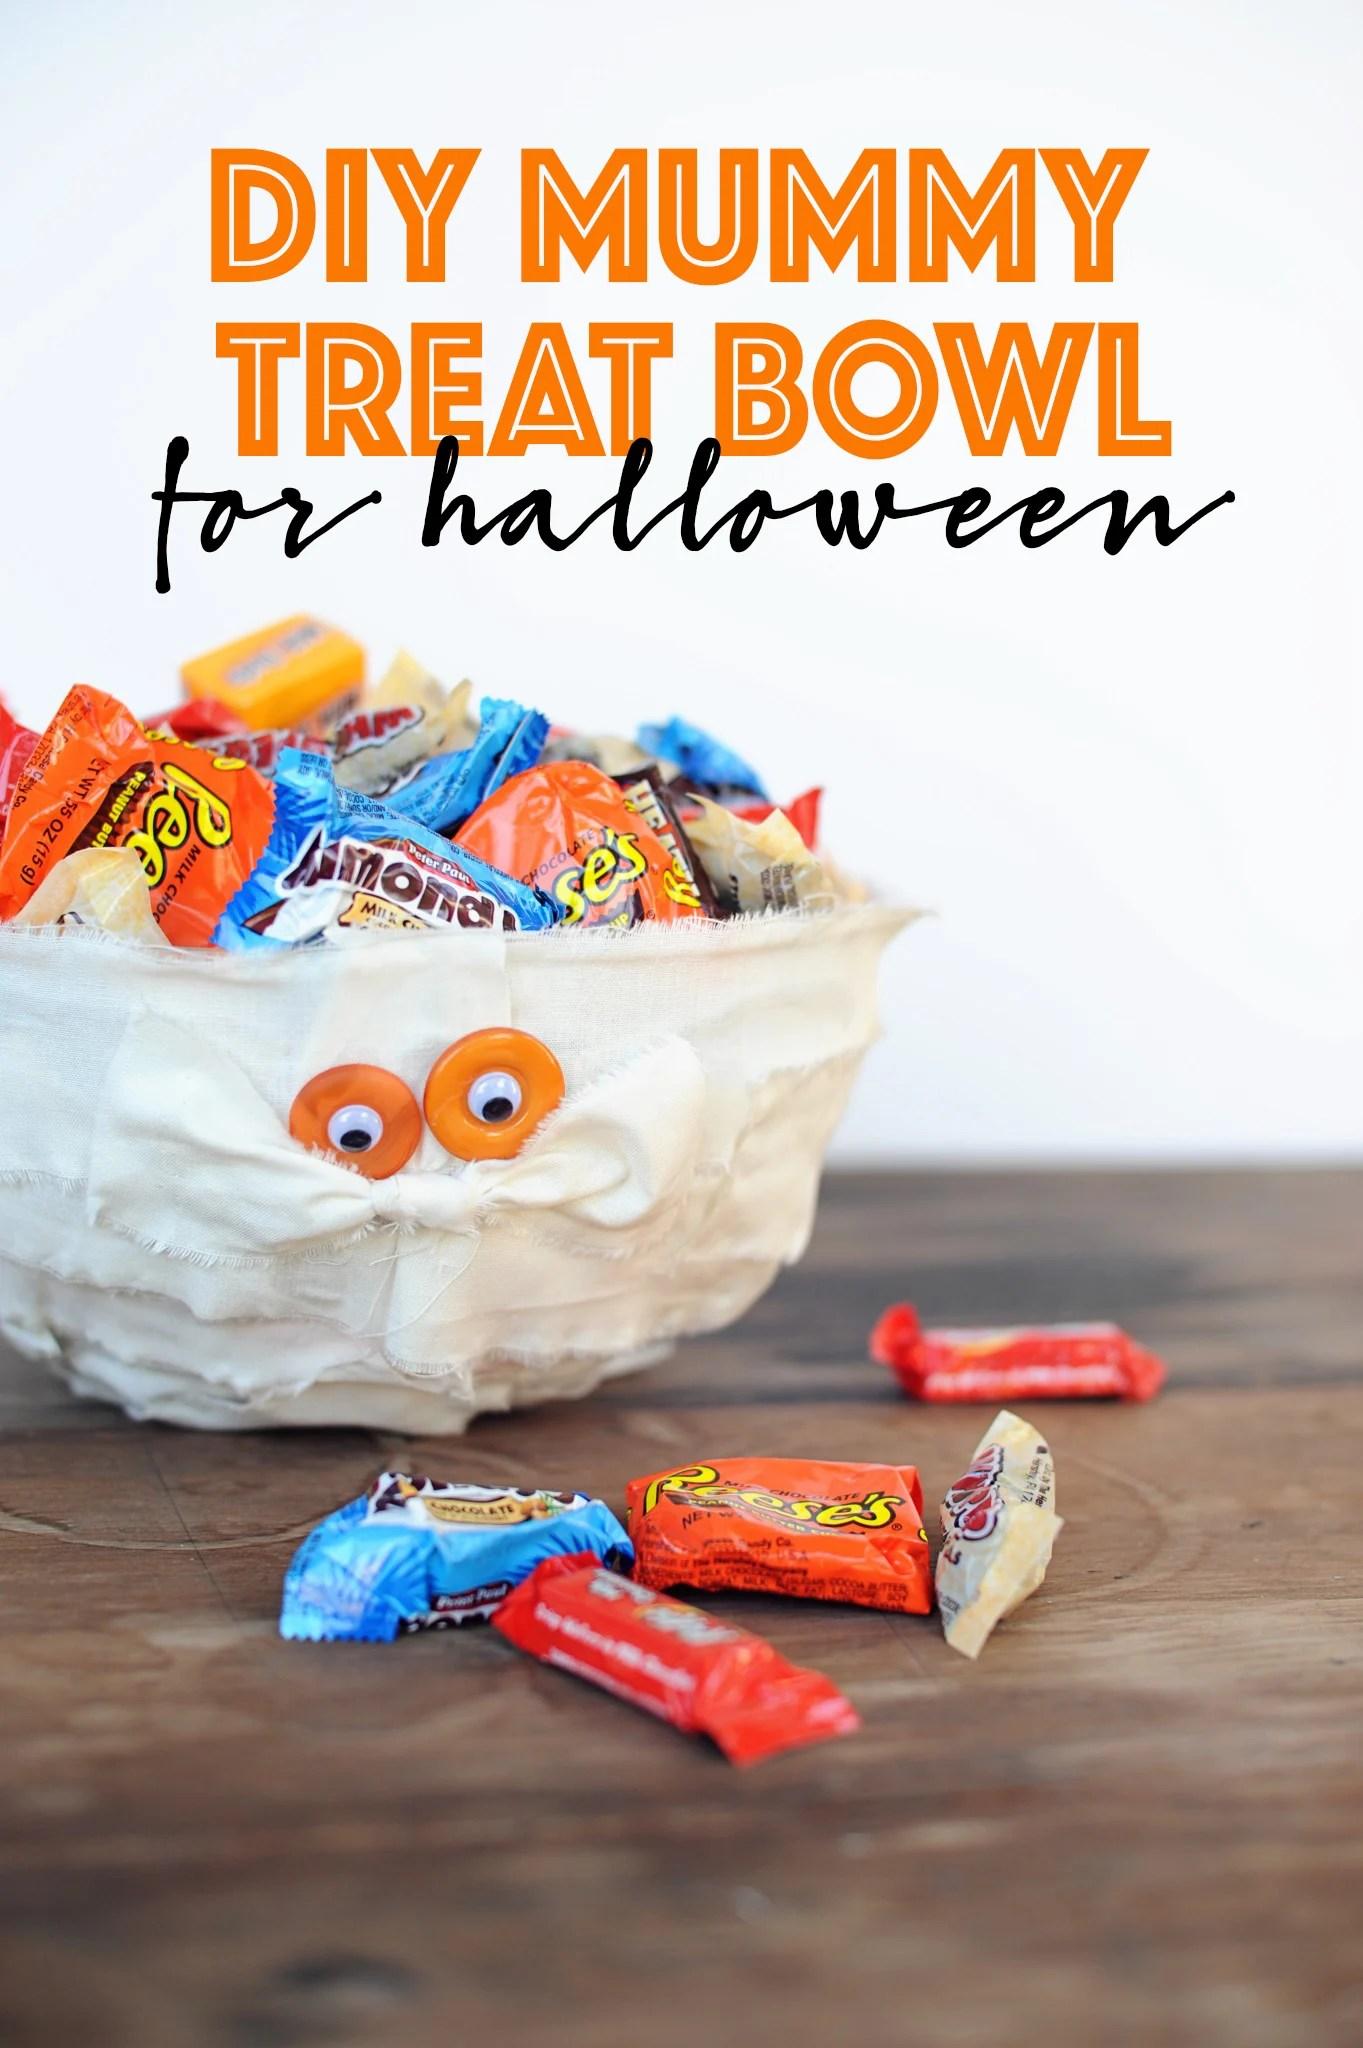 diy mummy bowl for halloween